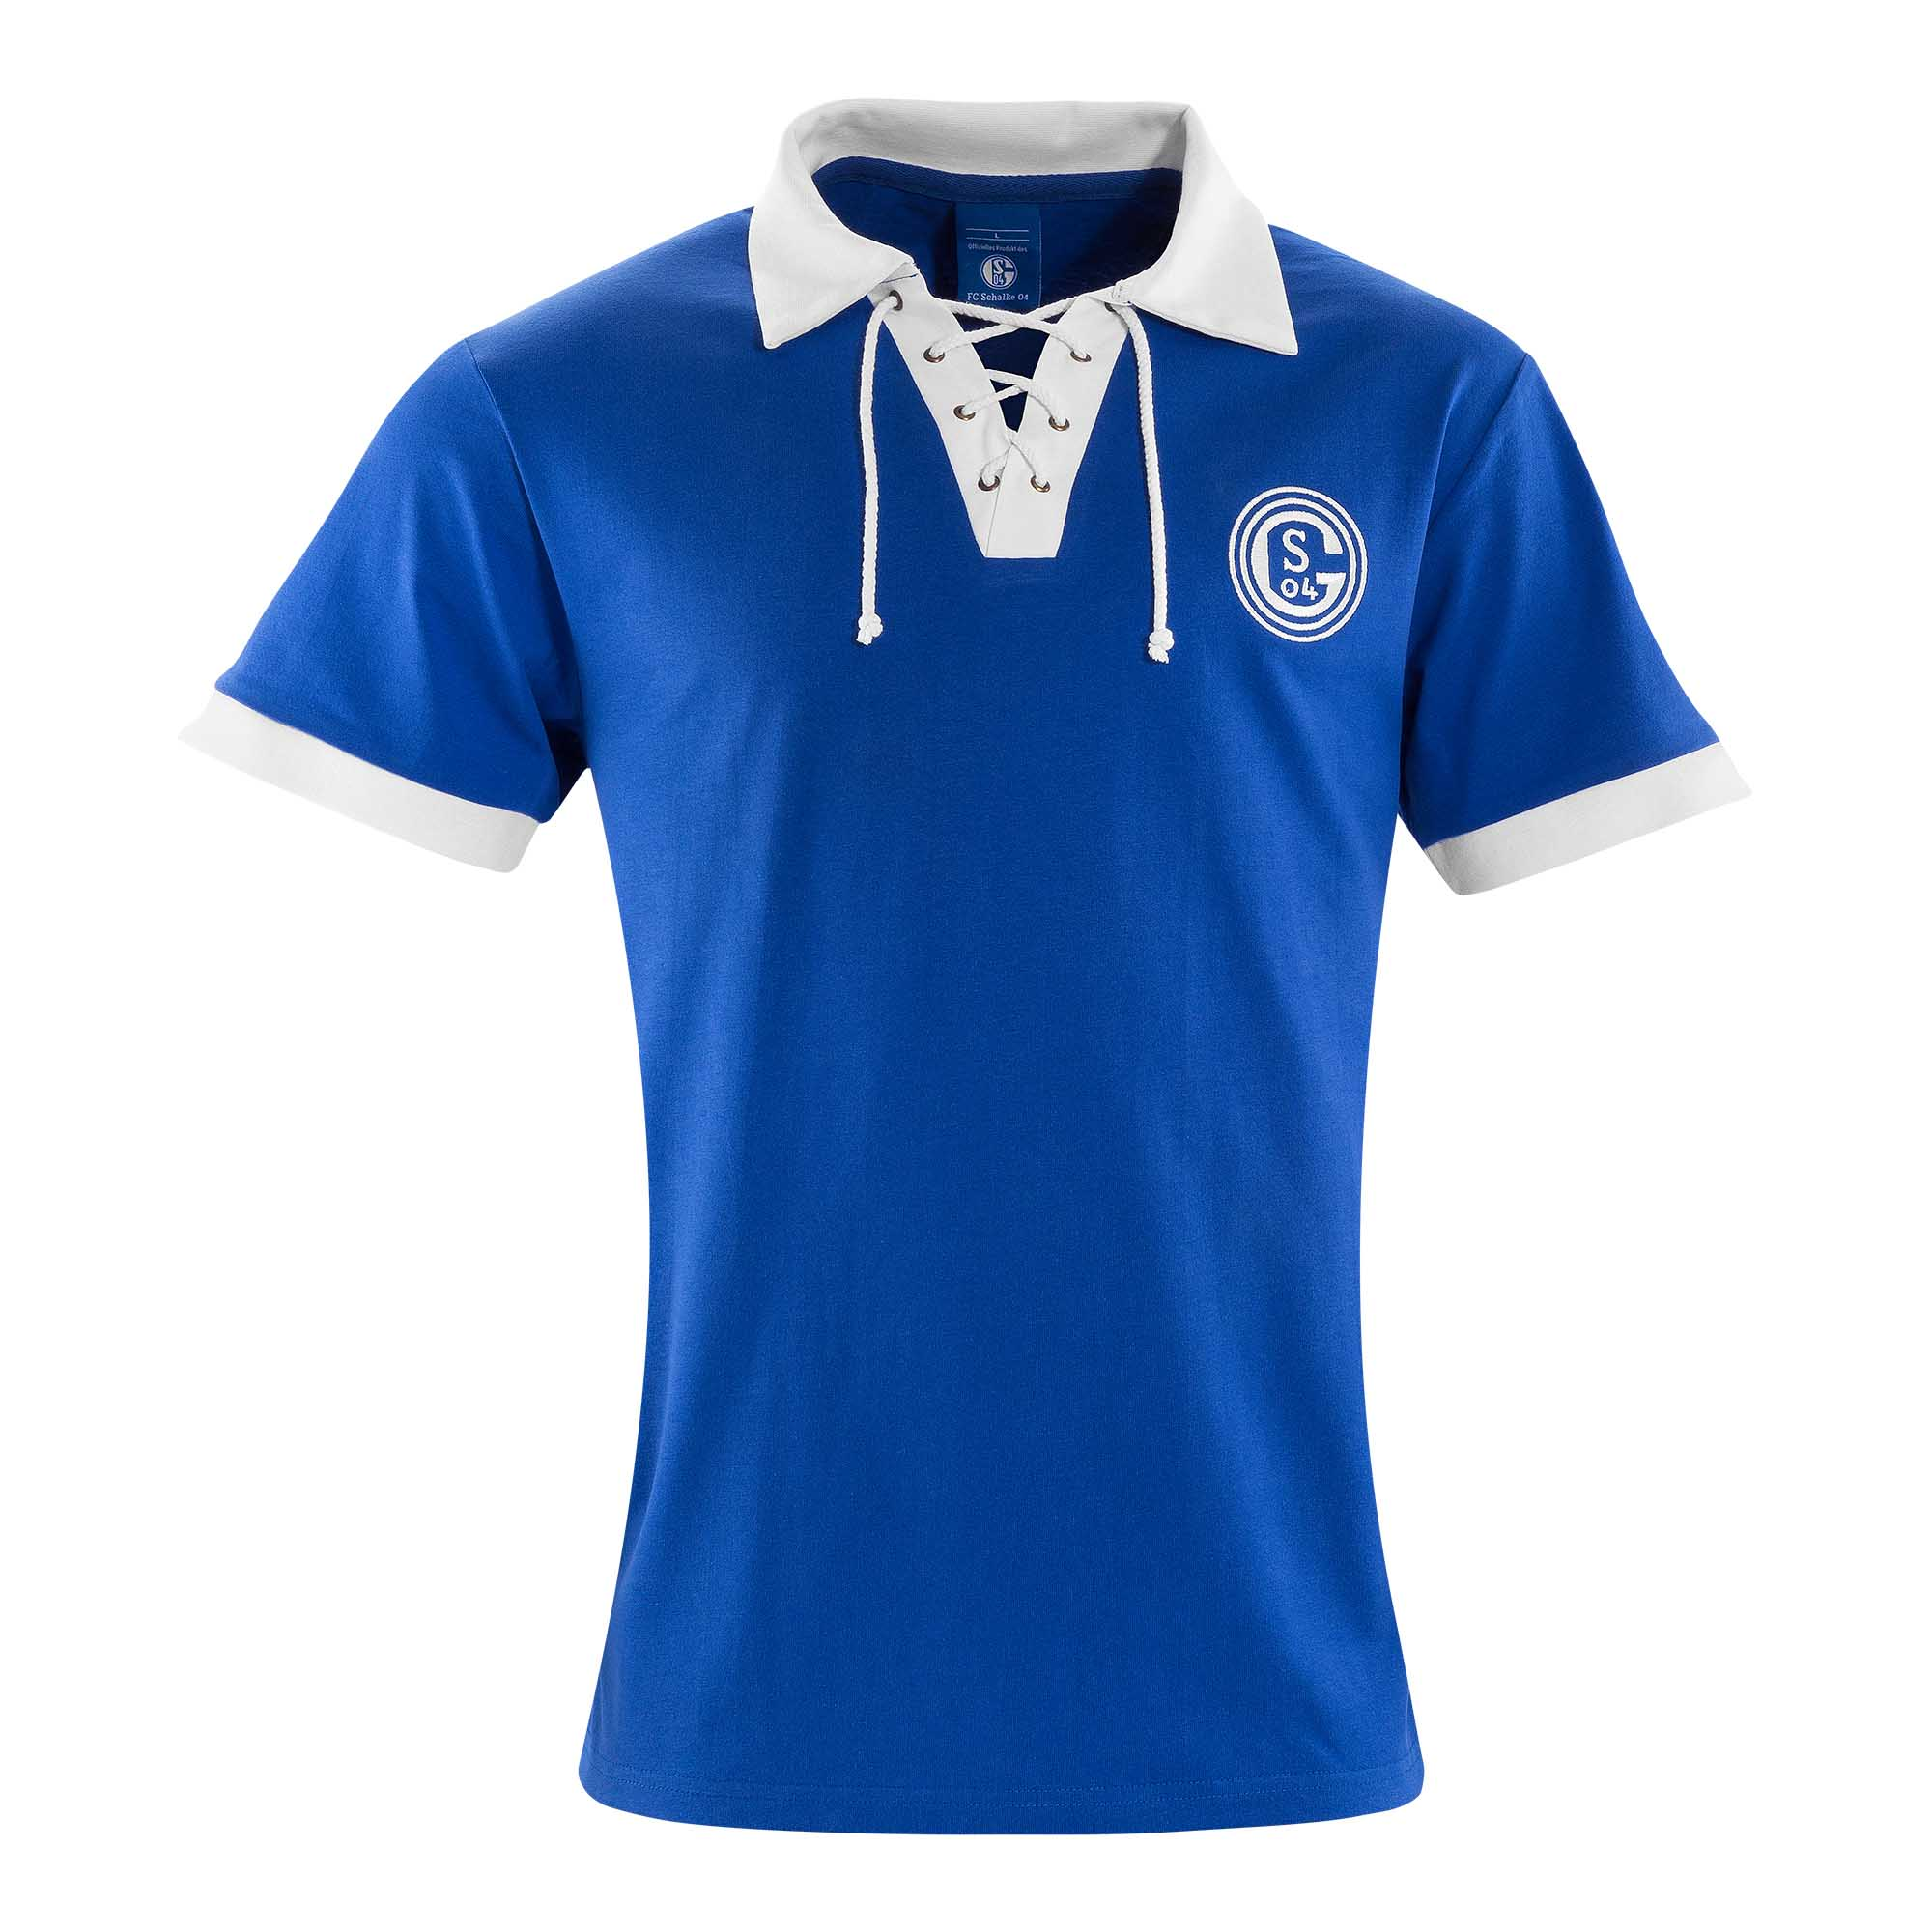 sale retailer 684ea 54ce1 Retro Shirt Tradition